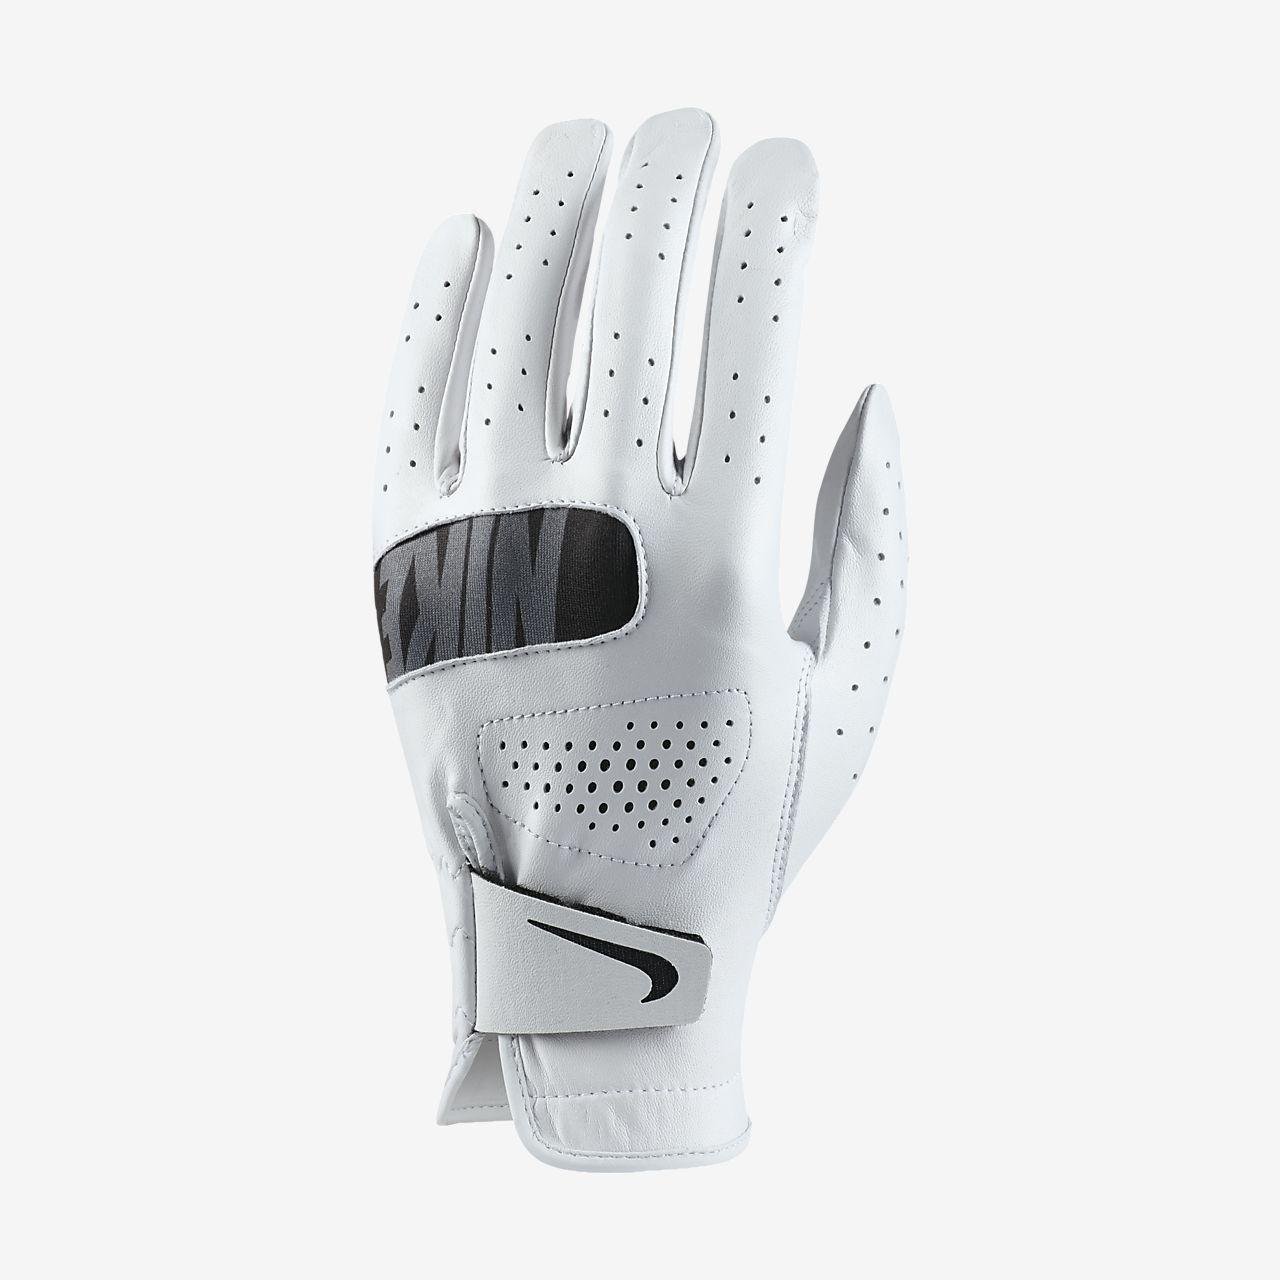 Gant de golf Nike Tour pour Femme (standard/gaucher)